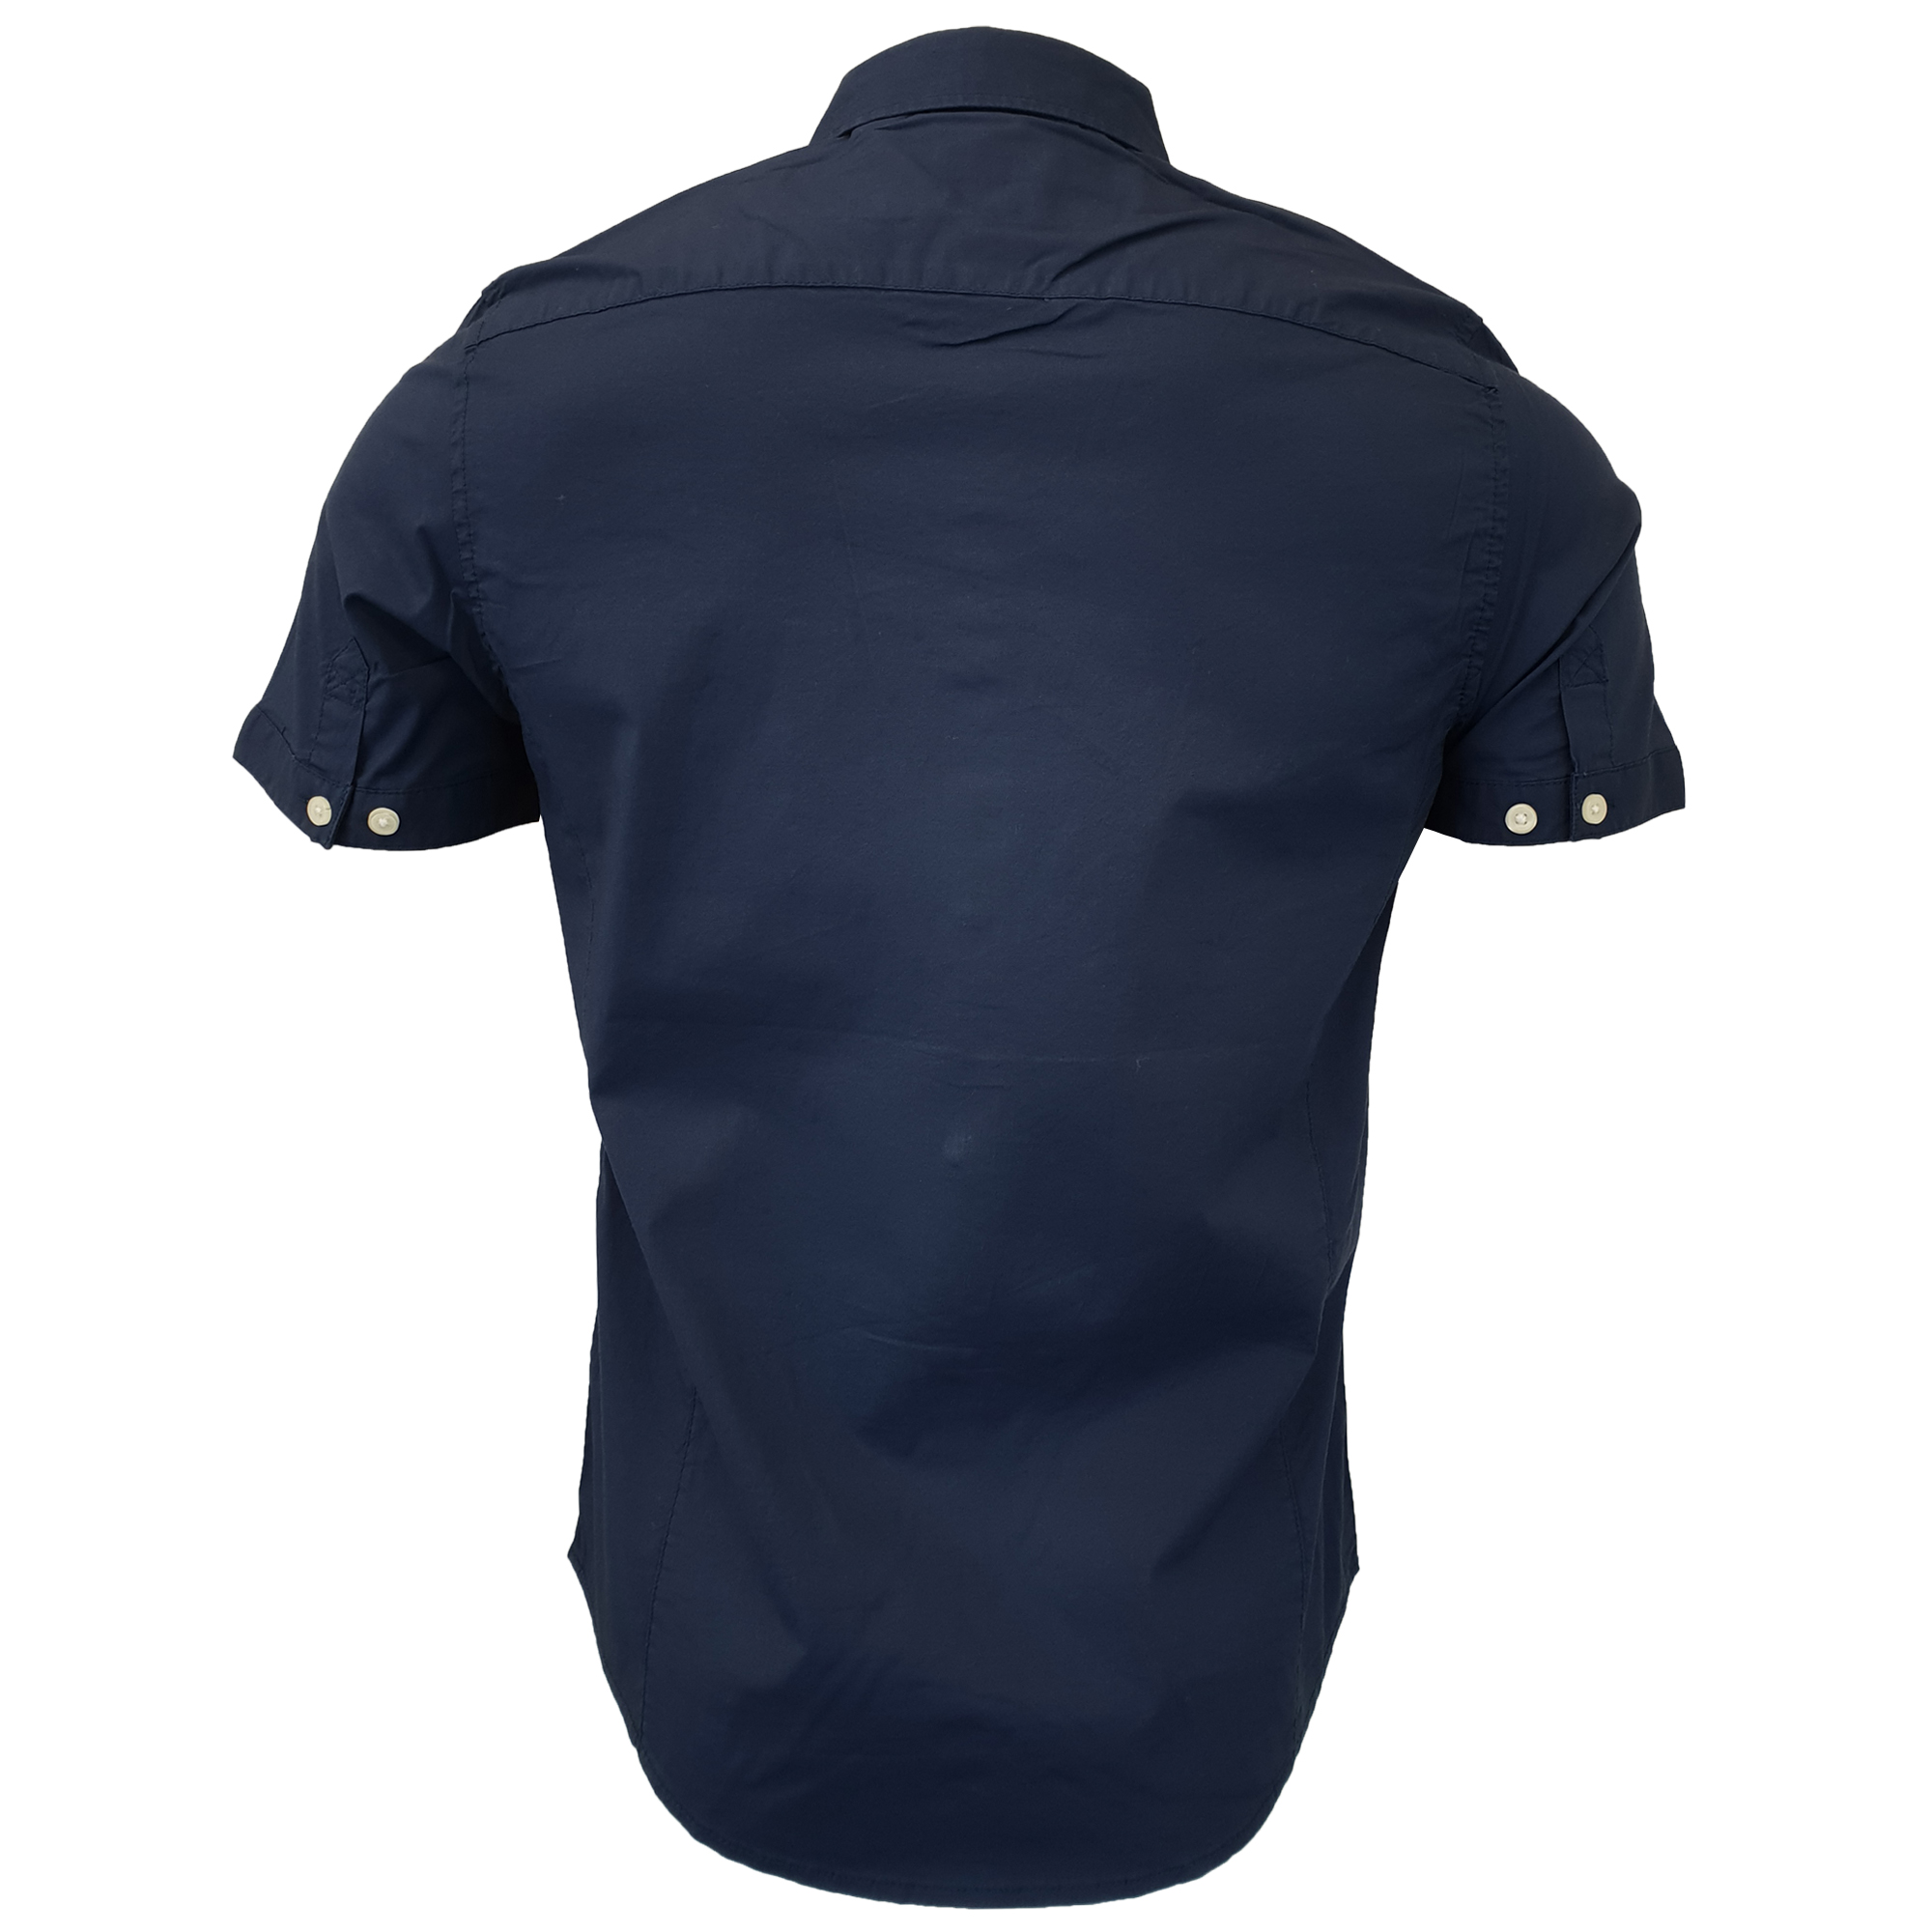 Mens-Linen-Cotton-Shirt-Tokyo-Laundry-Wells-Short-Sleeved-Grosvenor-Summer-New thumbnail 9